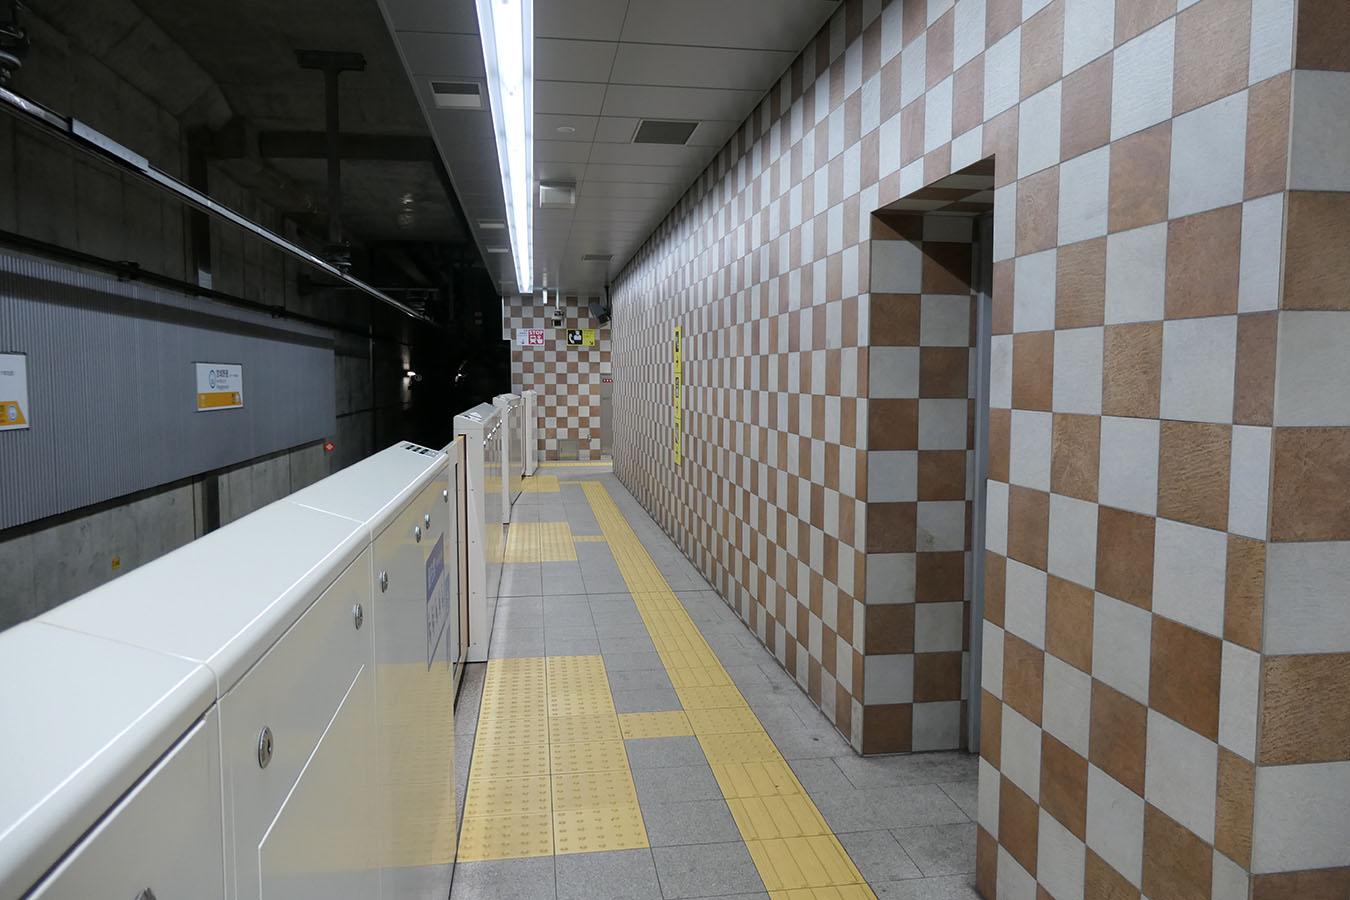 ss-t08_photo05.jpg